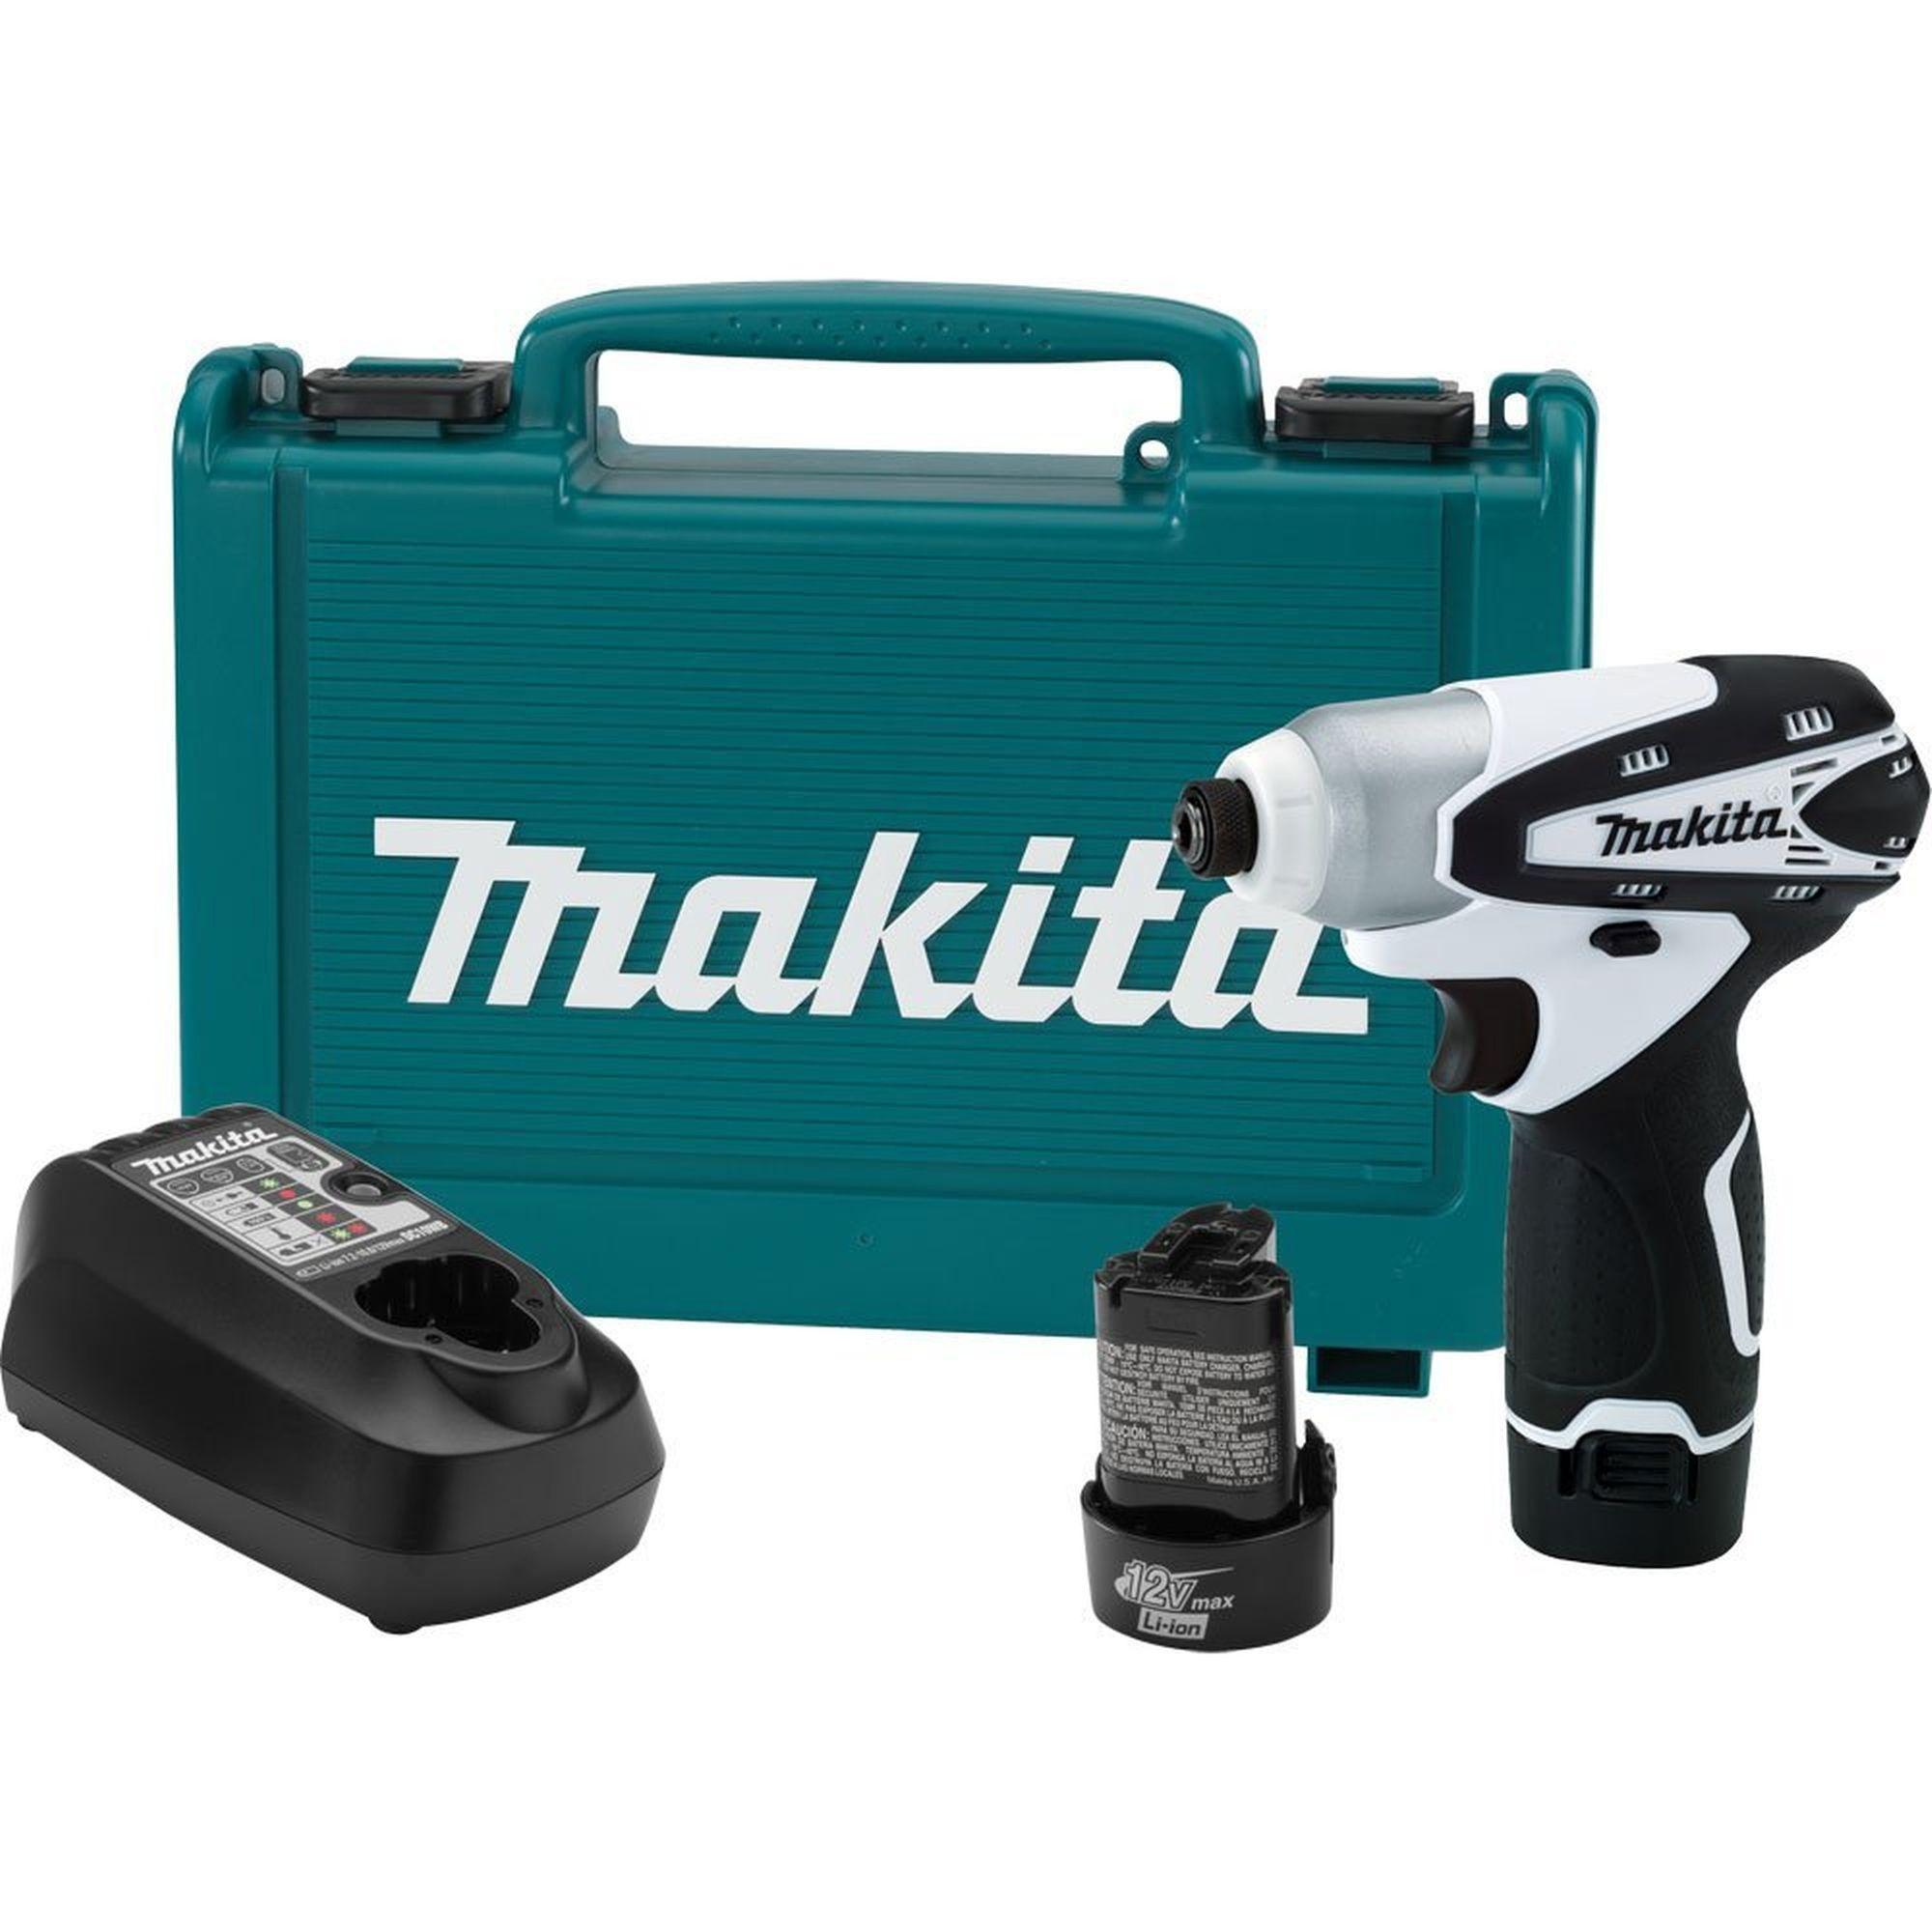 "MAKITA DT01W 12V Max LithiumIon 12 Volt 1/4"" Cordless"